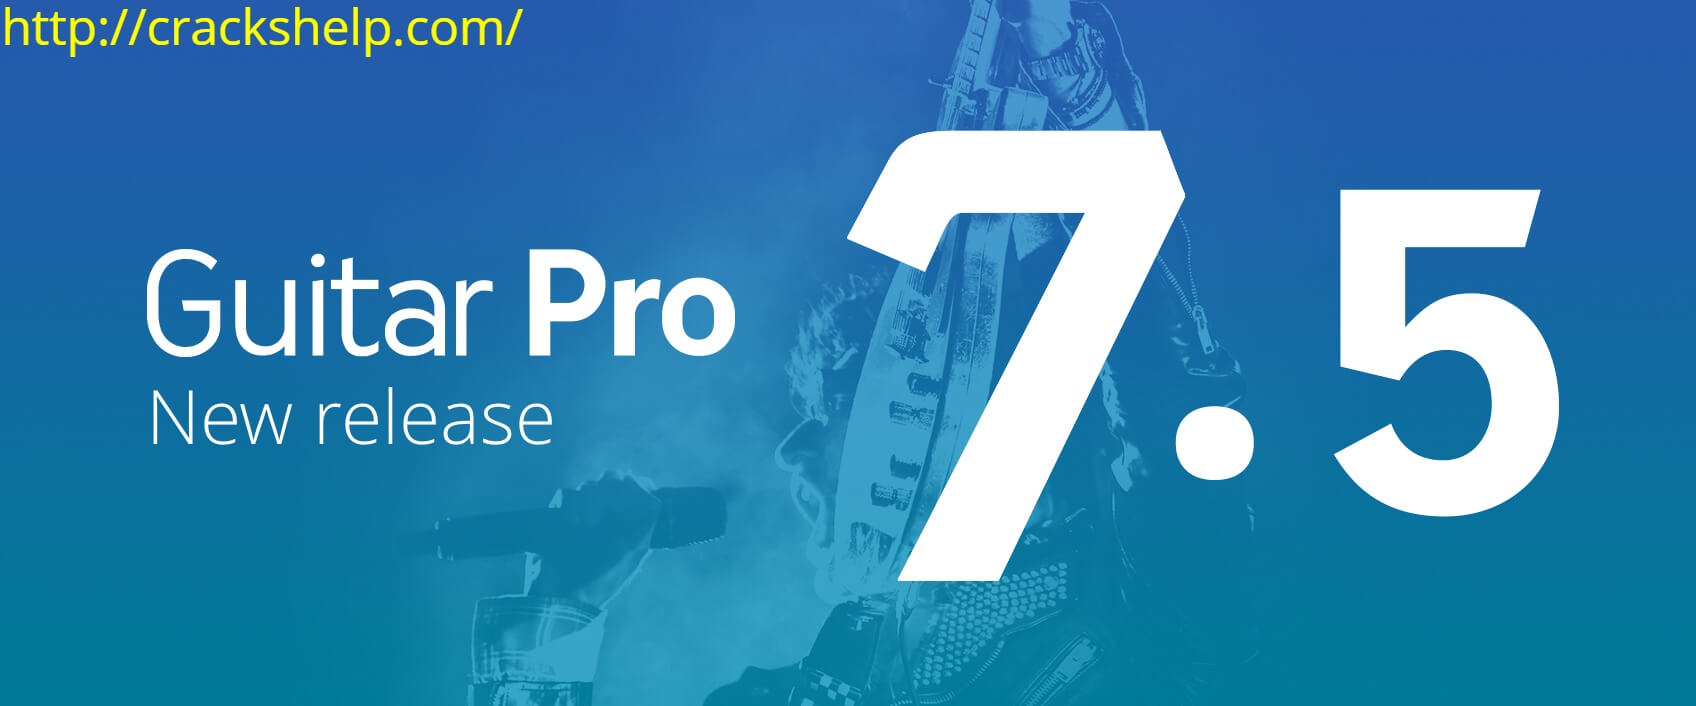 Guitar Pro 7.5.4 Crack + Activation Key Free Download